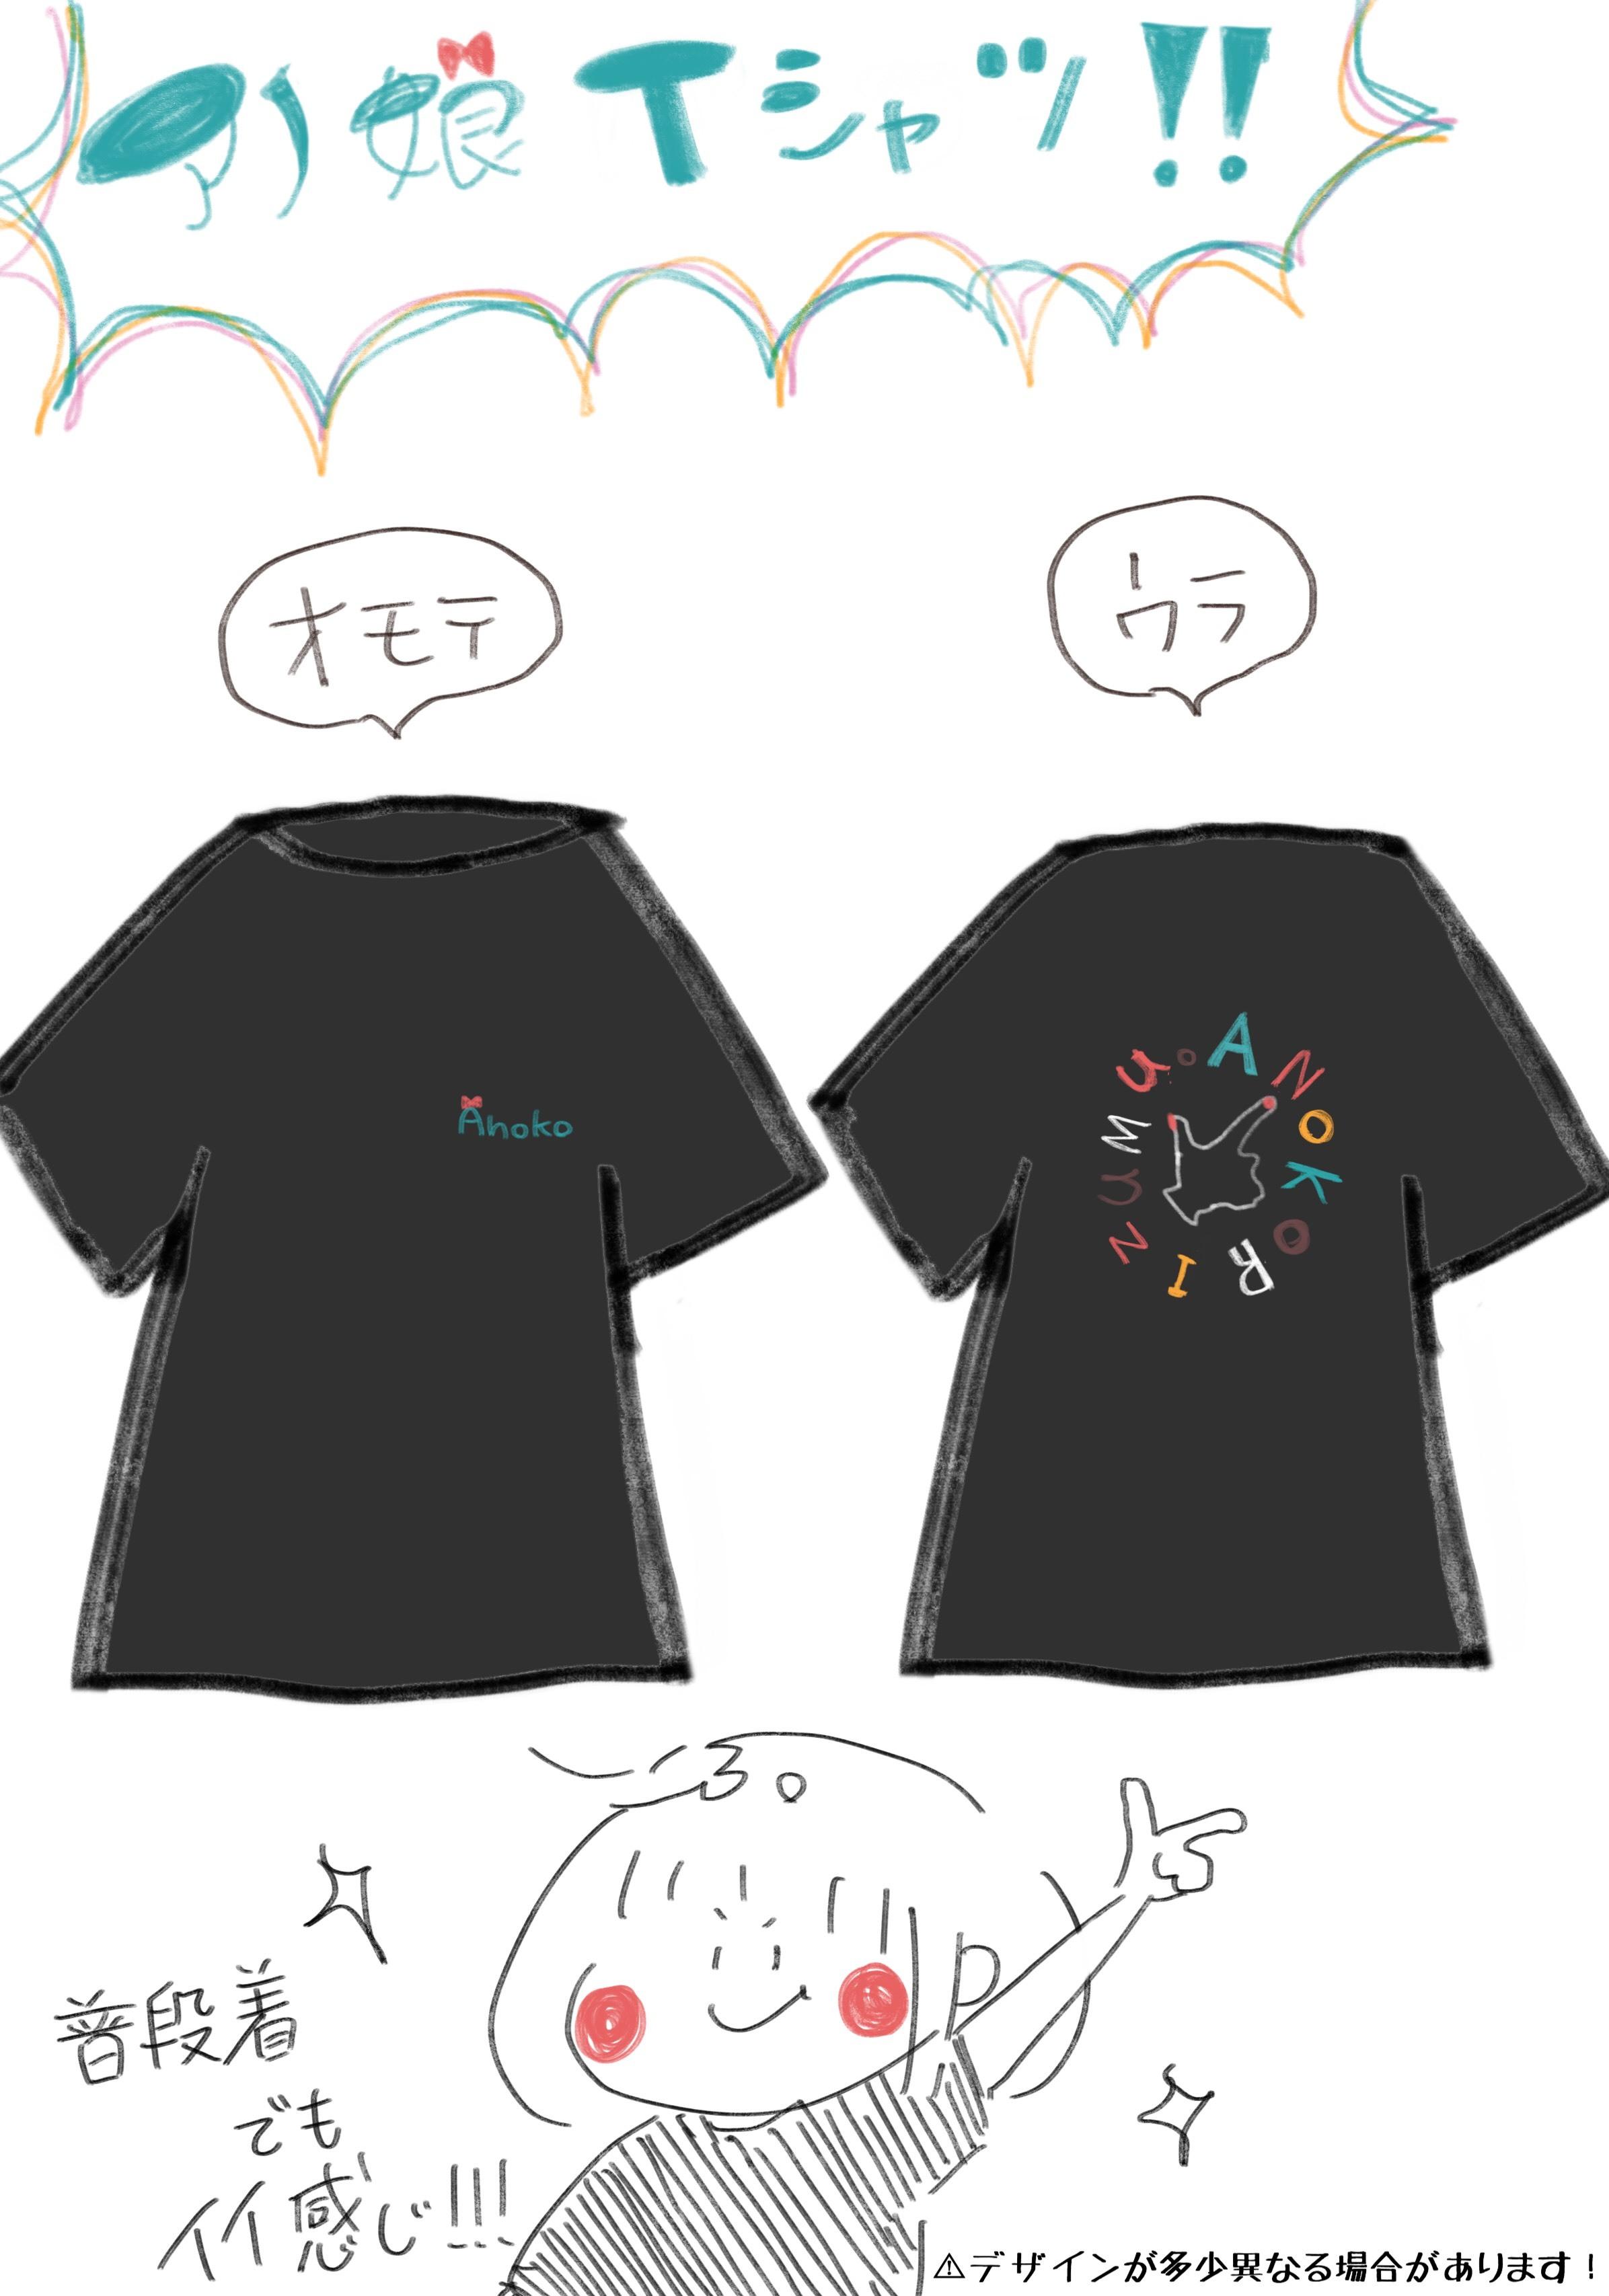 <MV制作記念限定Tシャツ プラン>